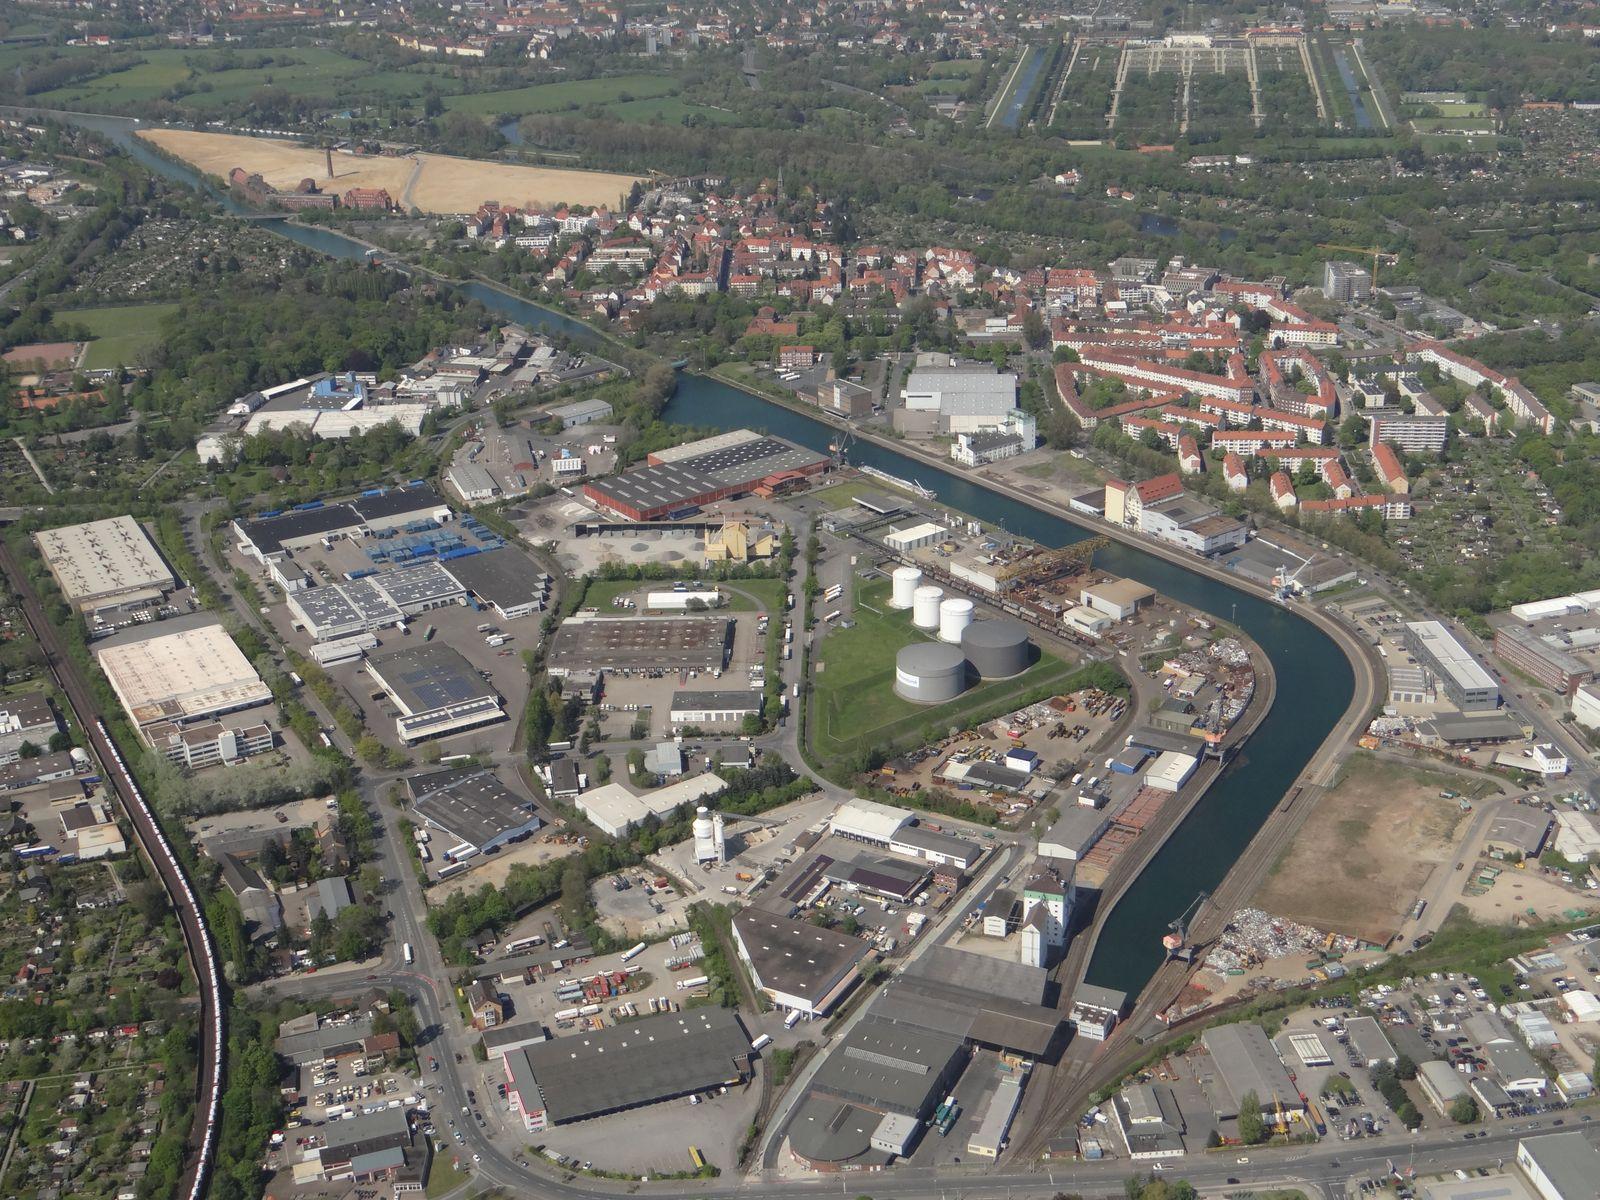 Hafen Hannover-Linden